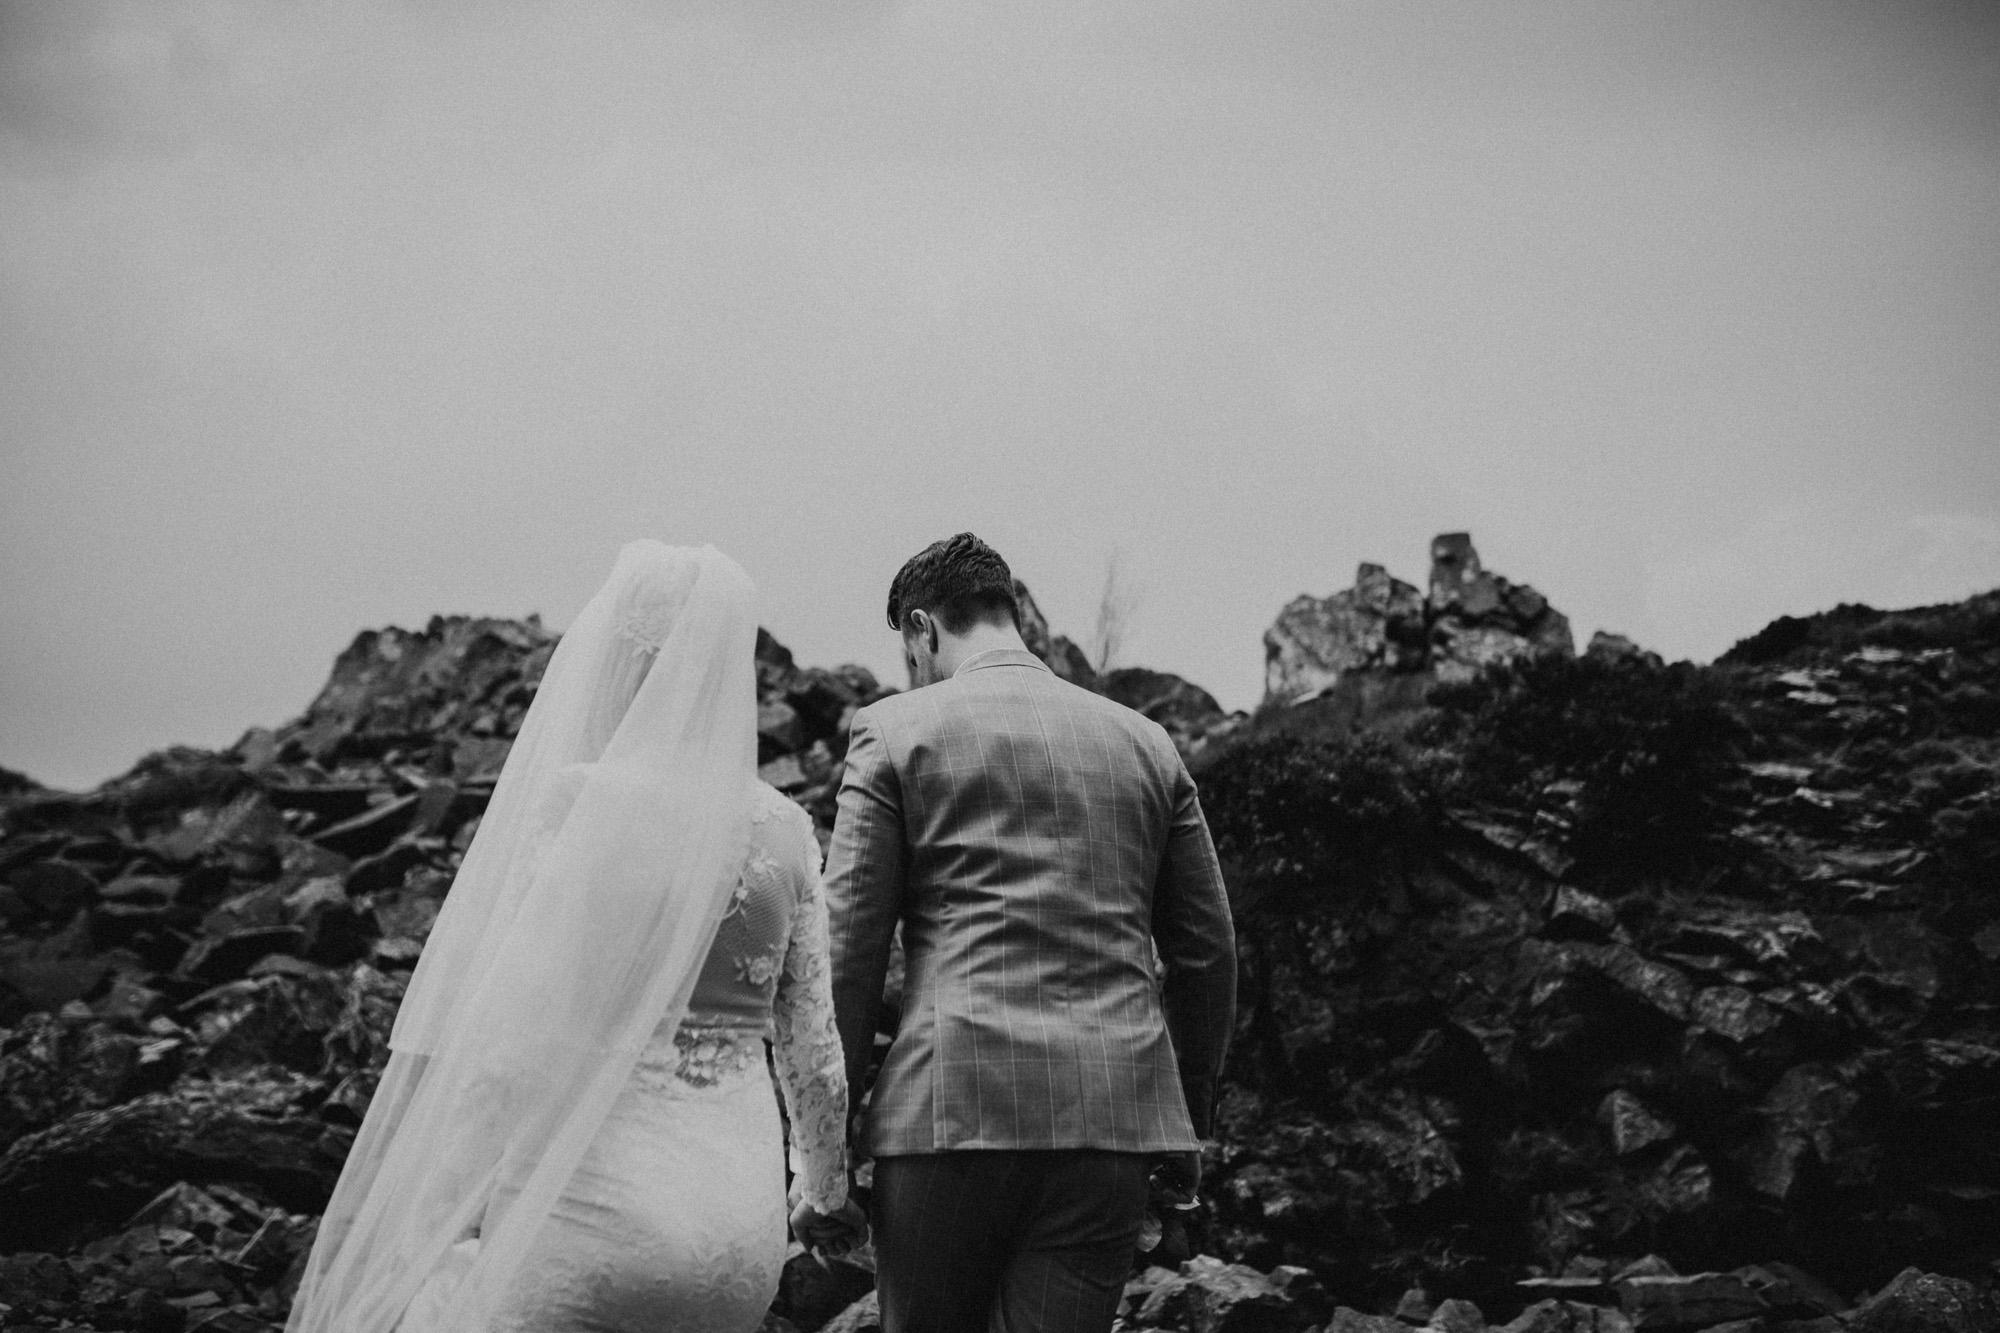 DanielaMarquardtPhotography_Hochzeitsfotograf_Düsseldorf_Köln_Mallorca_Bayern_Austria_Harz_LinaundMaik_Afterwedding-Shooting_Weddingphotographer_Ibiza_Tuskany_Italien_Toskana89